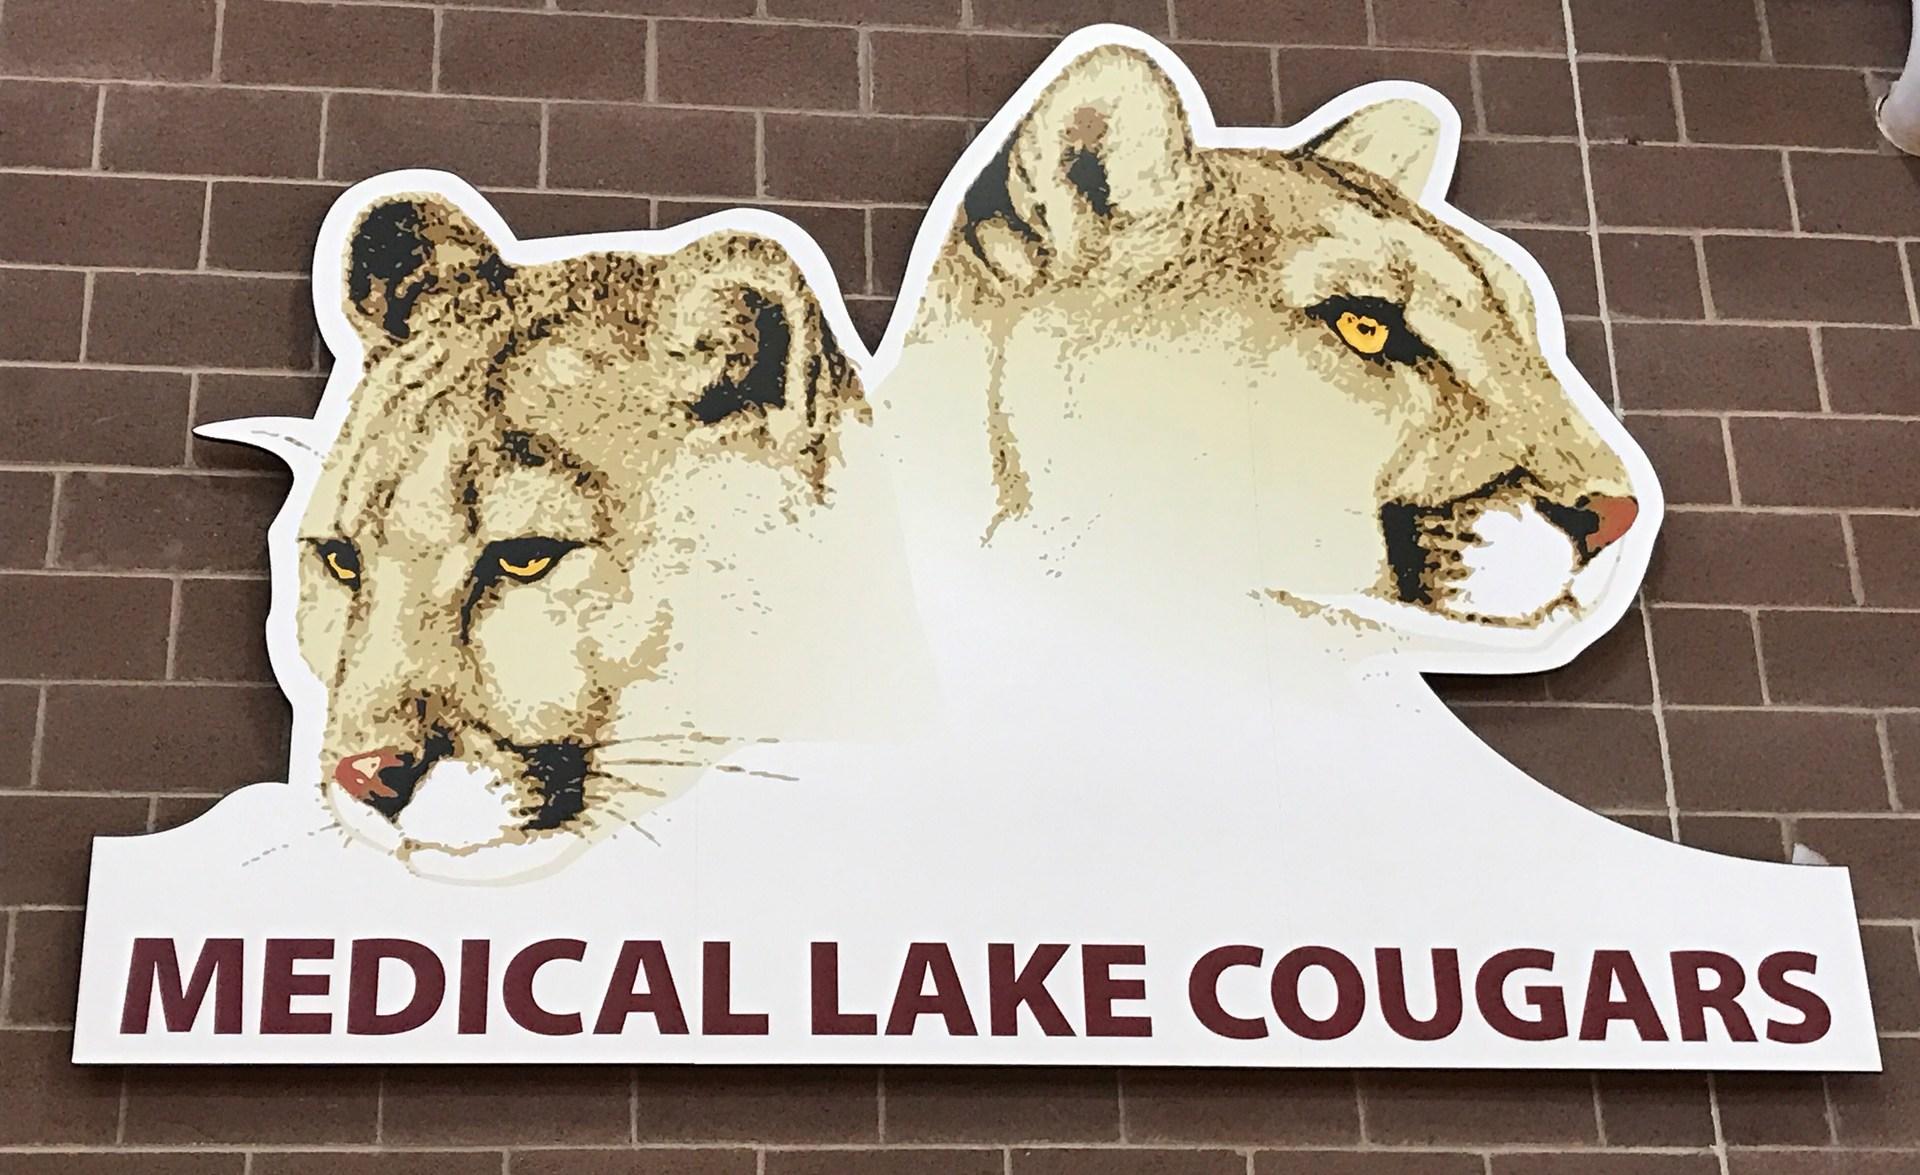 Cougar sign